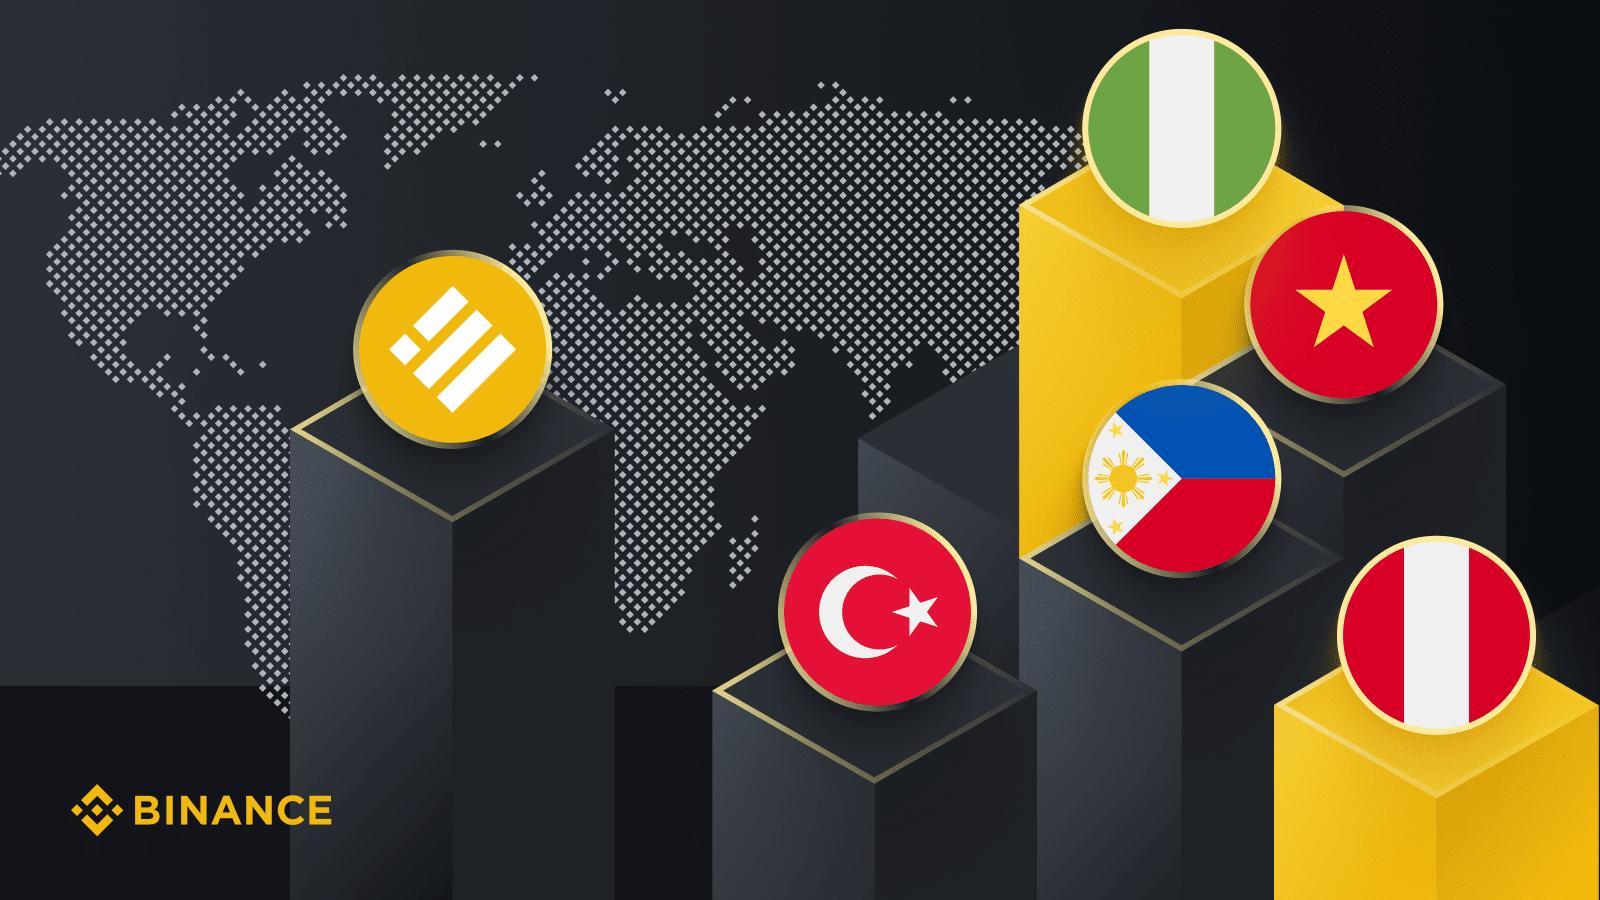 kripto para 5 ülke